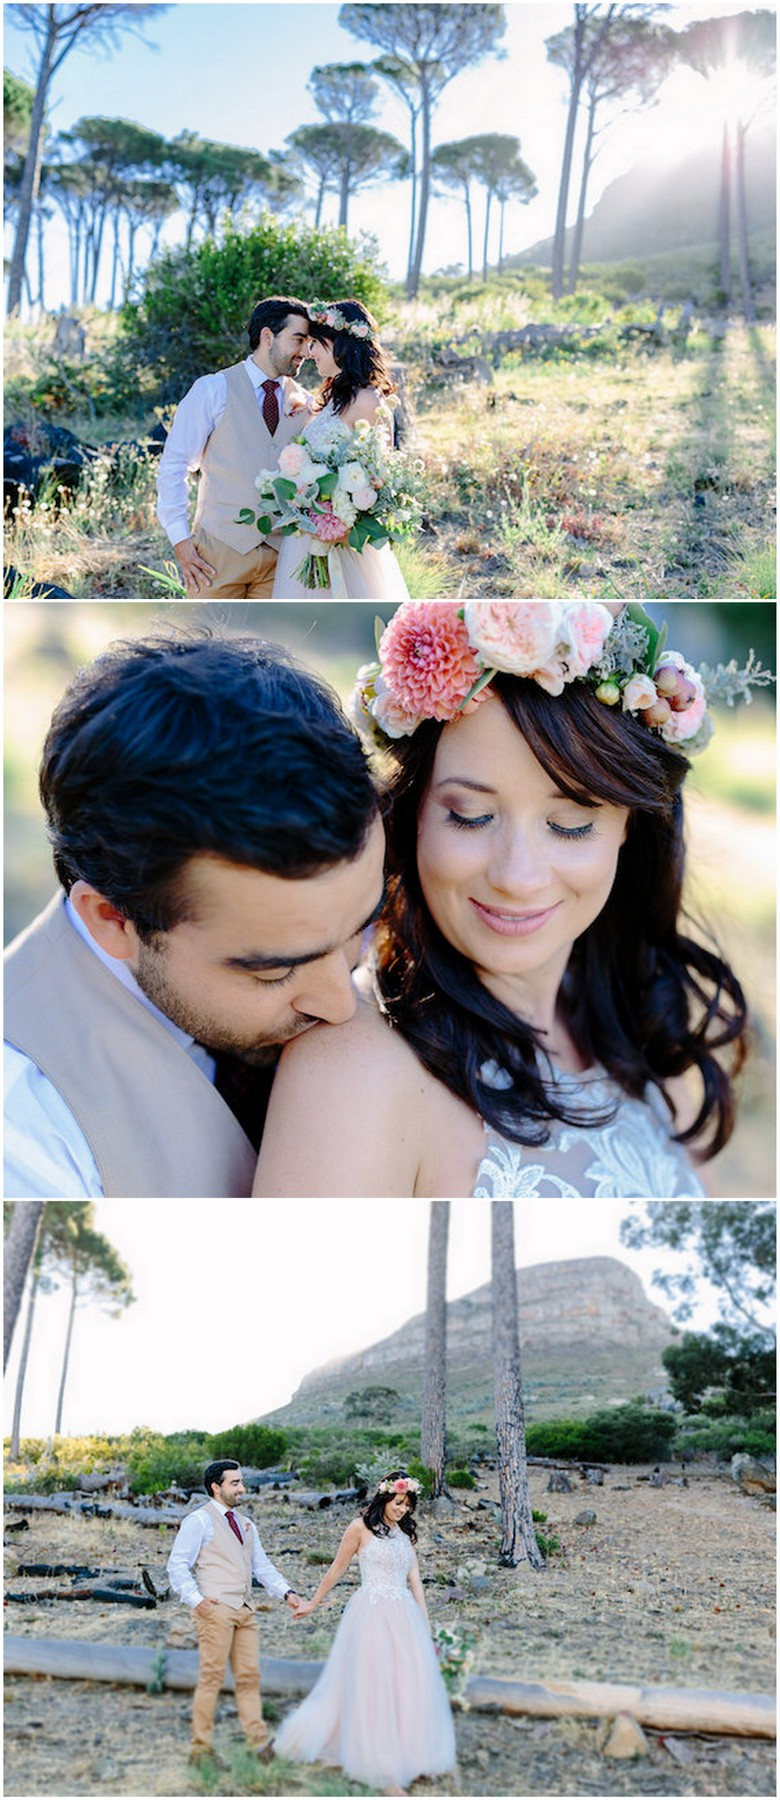 Signal Hill Couple Photograph Ideas